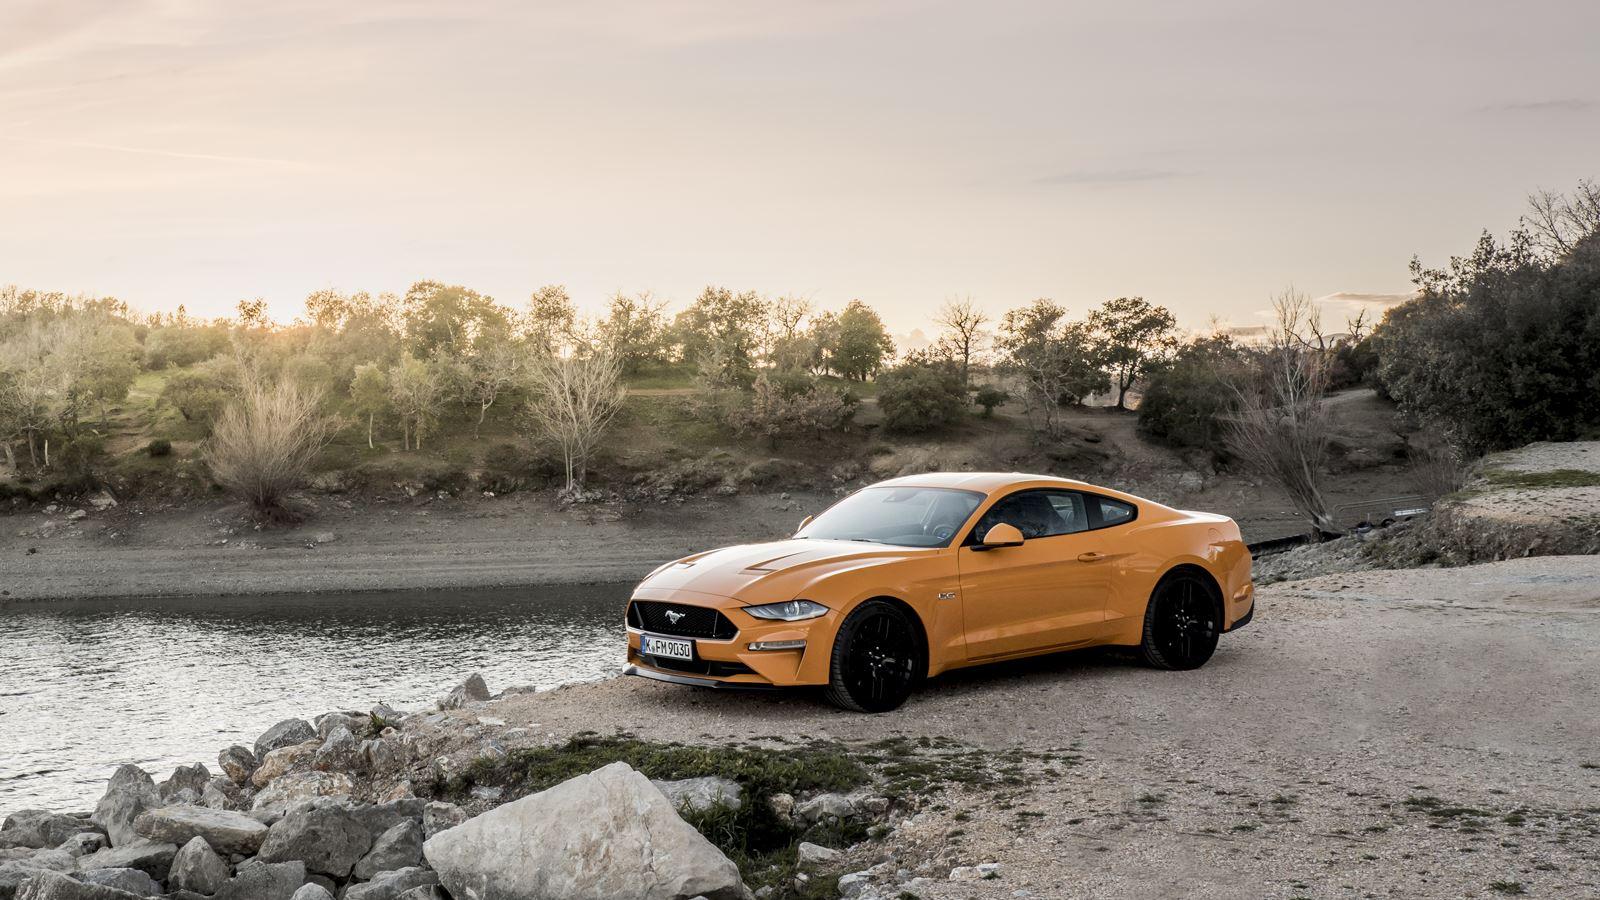 Ford Mustang aan het water